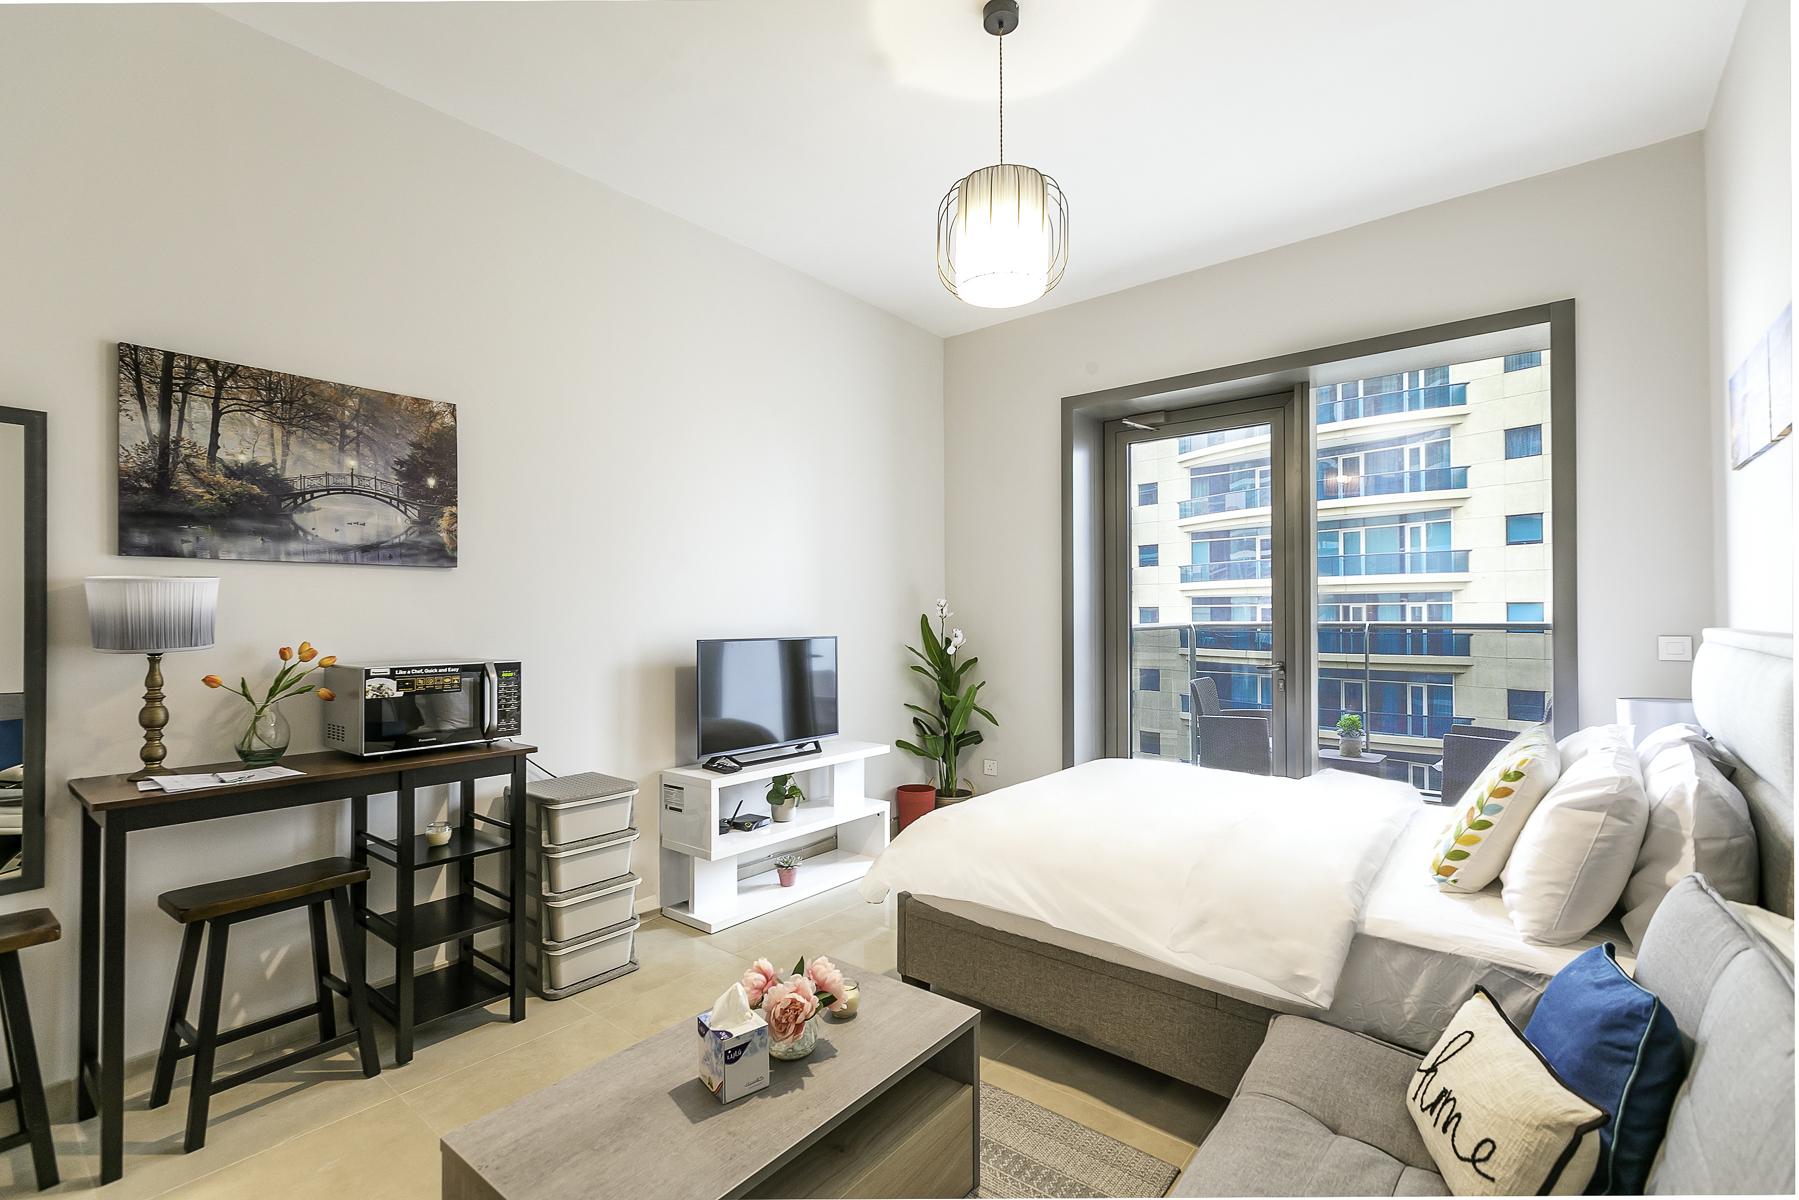 Apartment Brand New Studio Next To Tram   Amazing Marina View   JBR Beach Access  505 photo 20934860